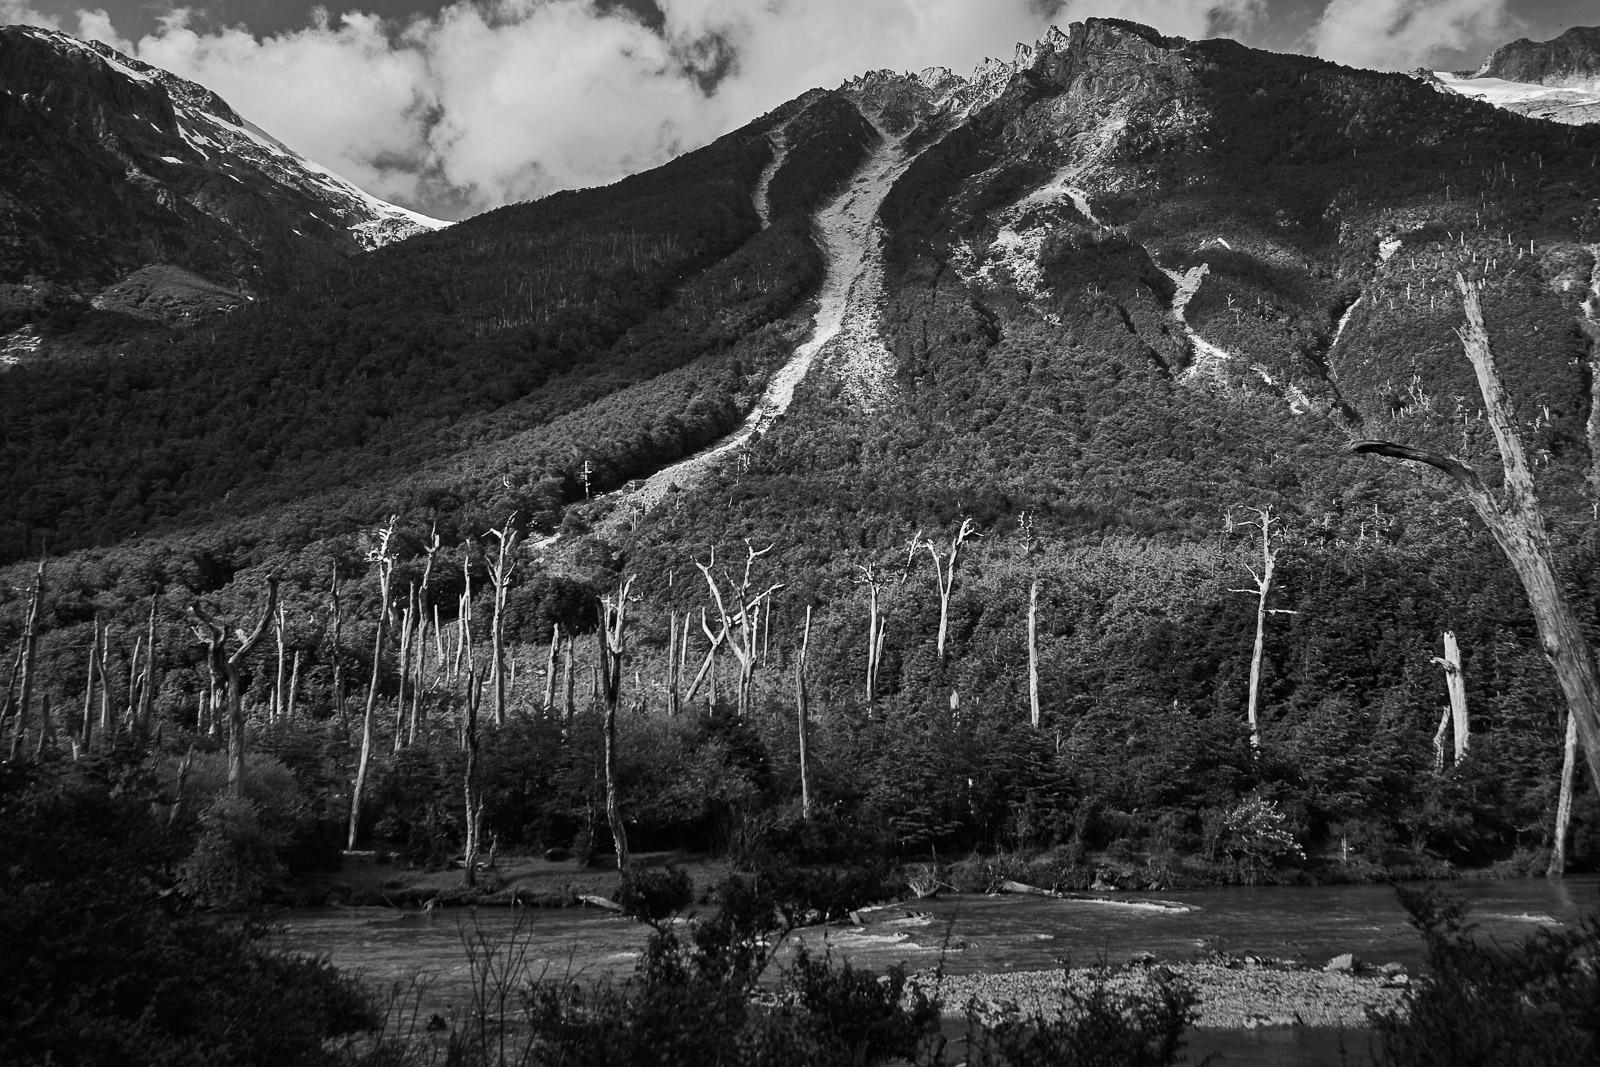 Río Ibáñez. - Aysén - Eduardo Cerda. Fotografías de Aysén.Chile.